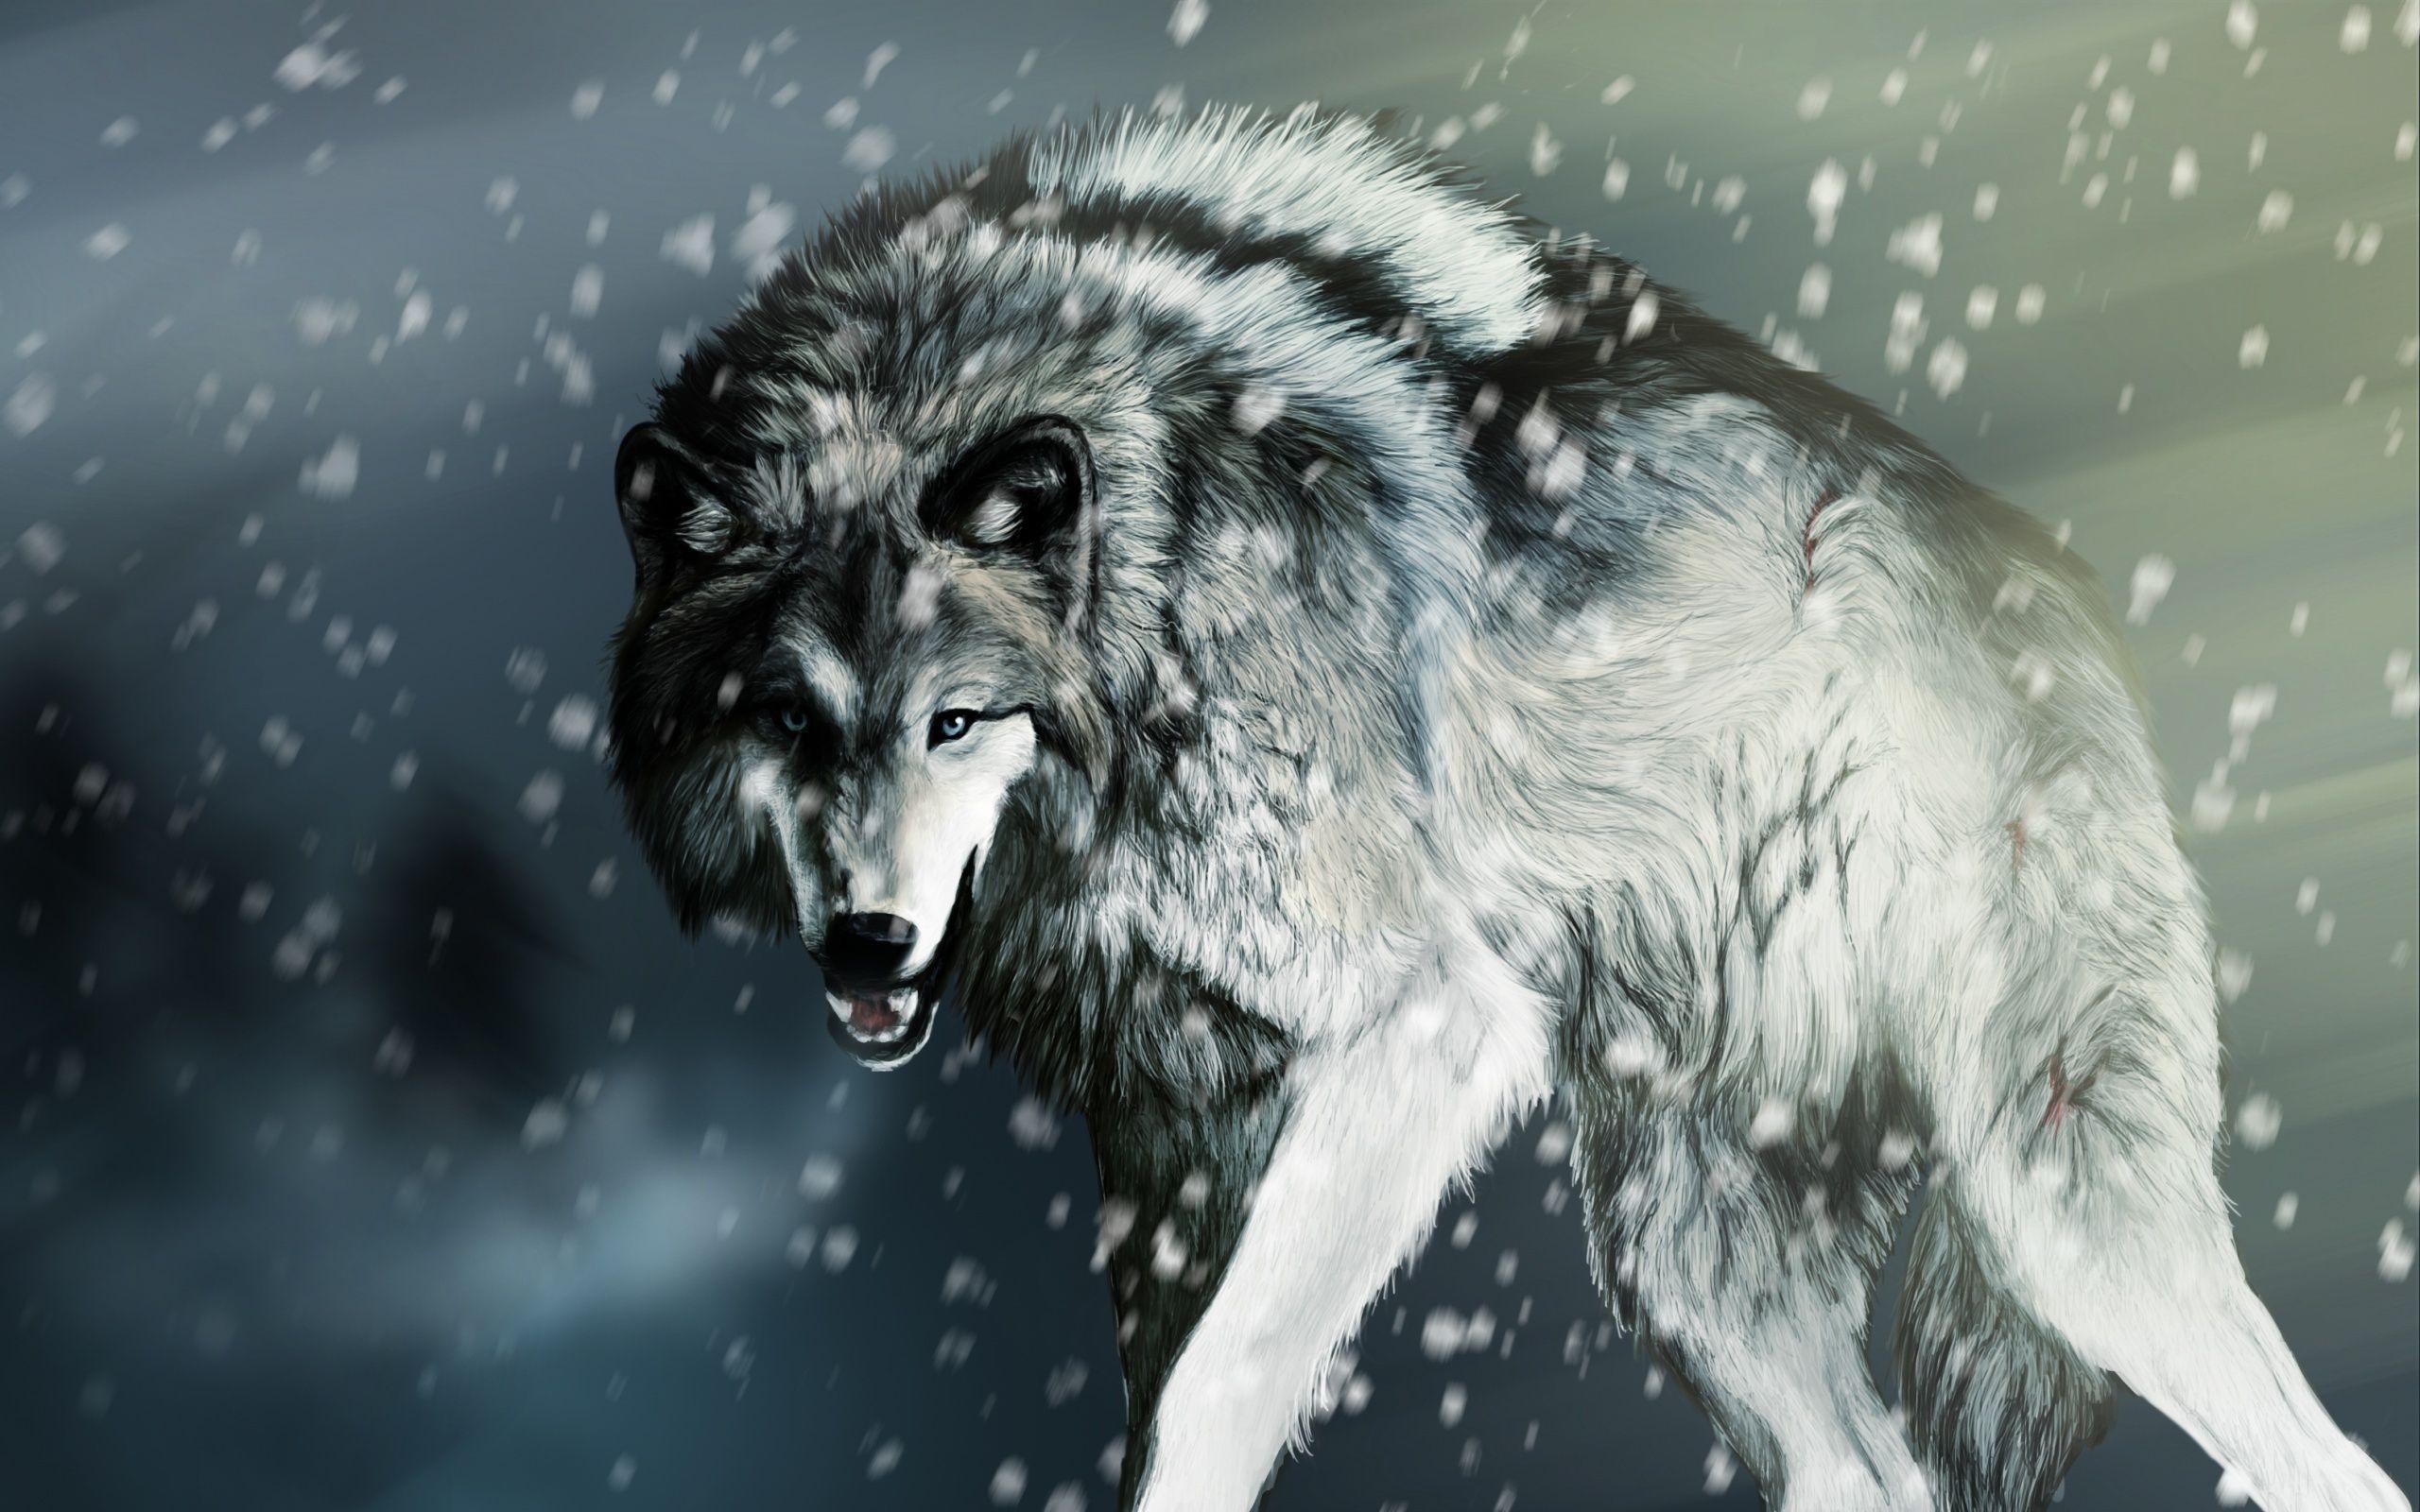 Alpha Wolf Wallpapers Top Free Alpha Wolf Backgrounds Wallpaperaccess